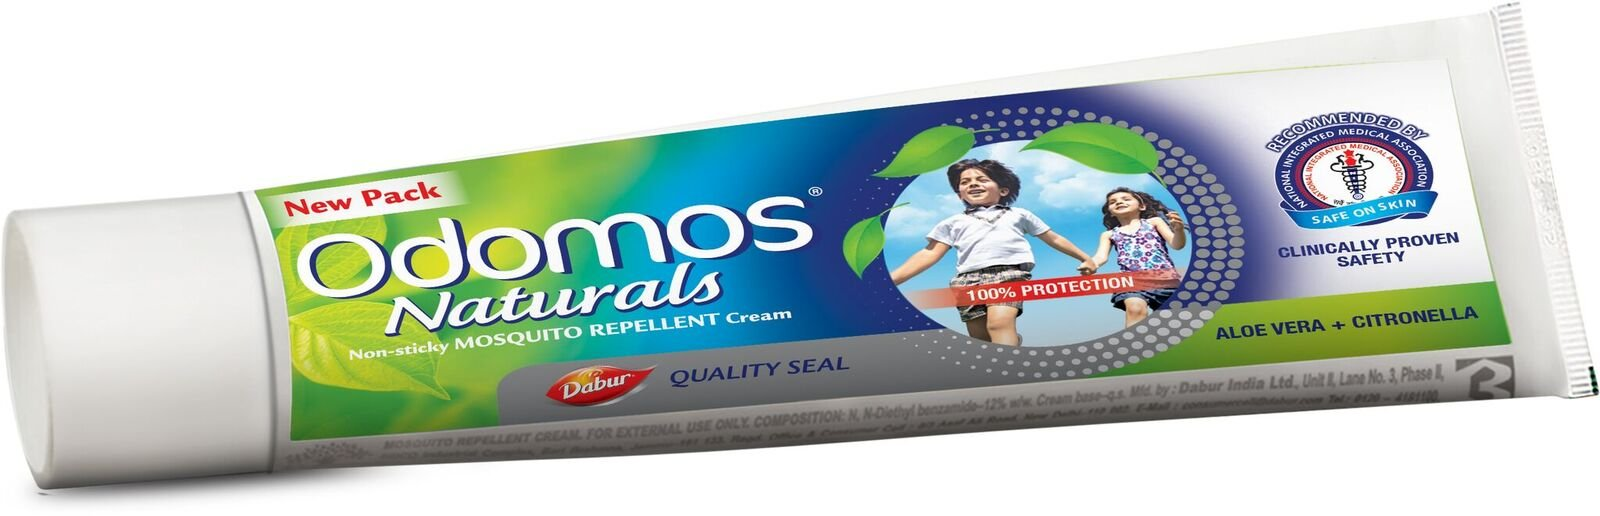 Dabur Odomos Non Sticky Mosquito Repellent Herbal Cream 100 grm  Aloe Vera